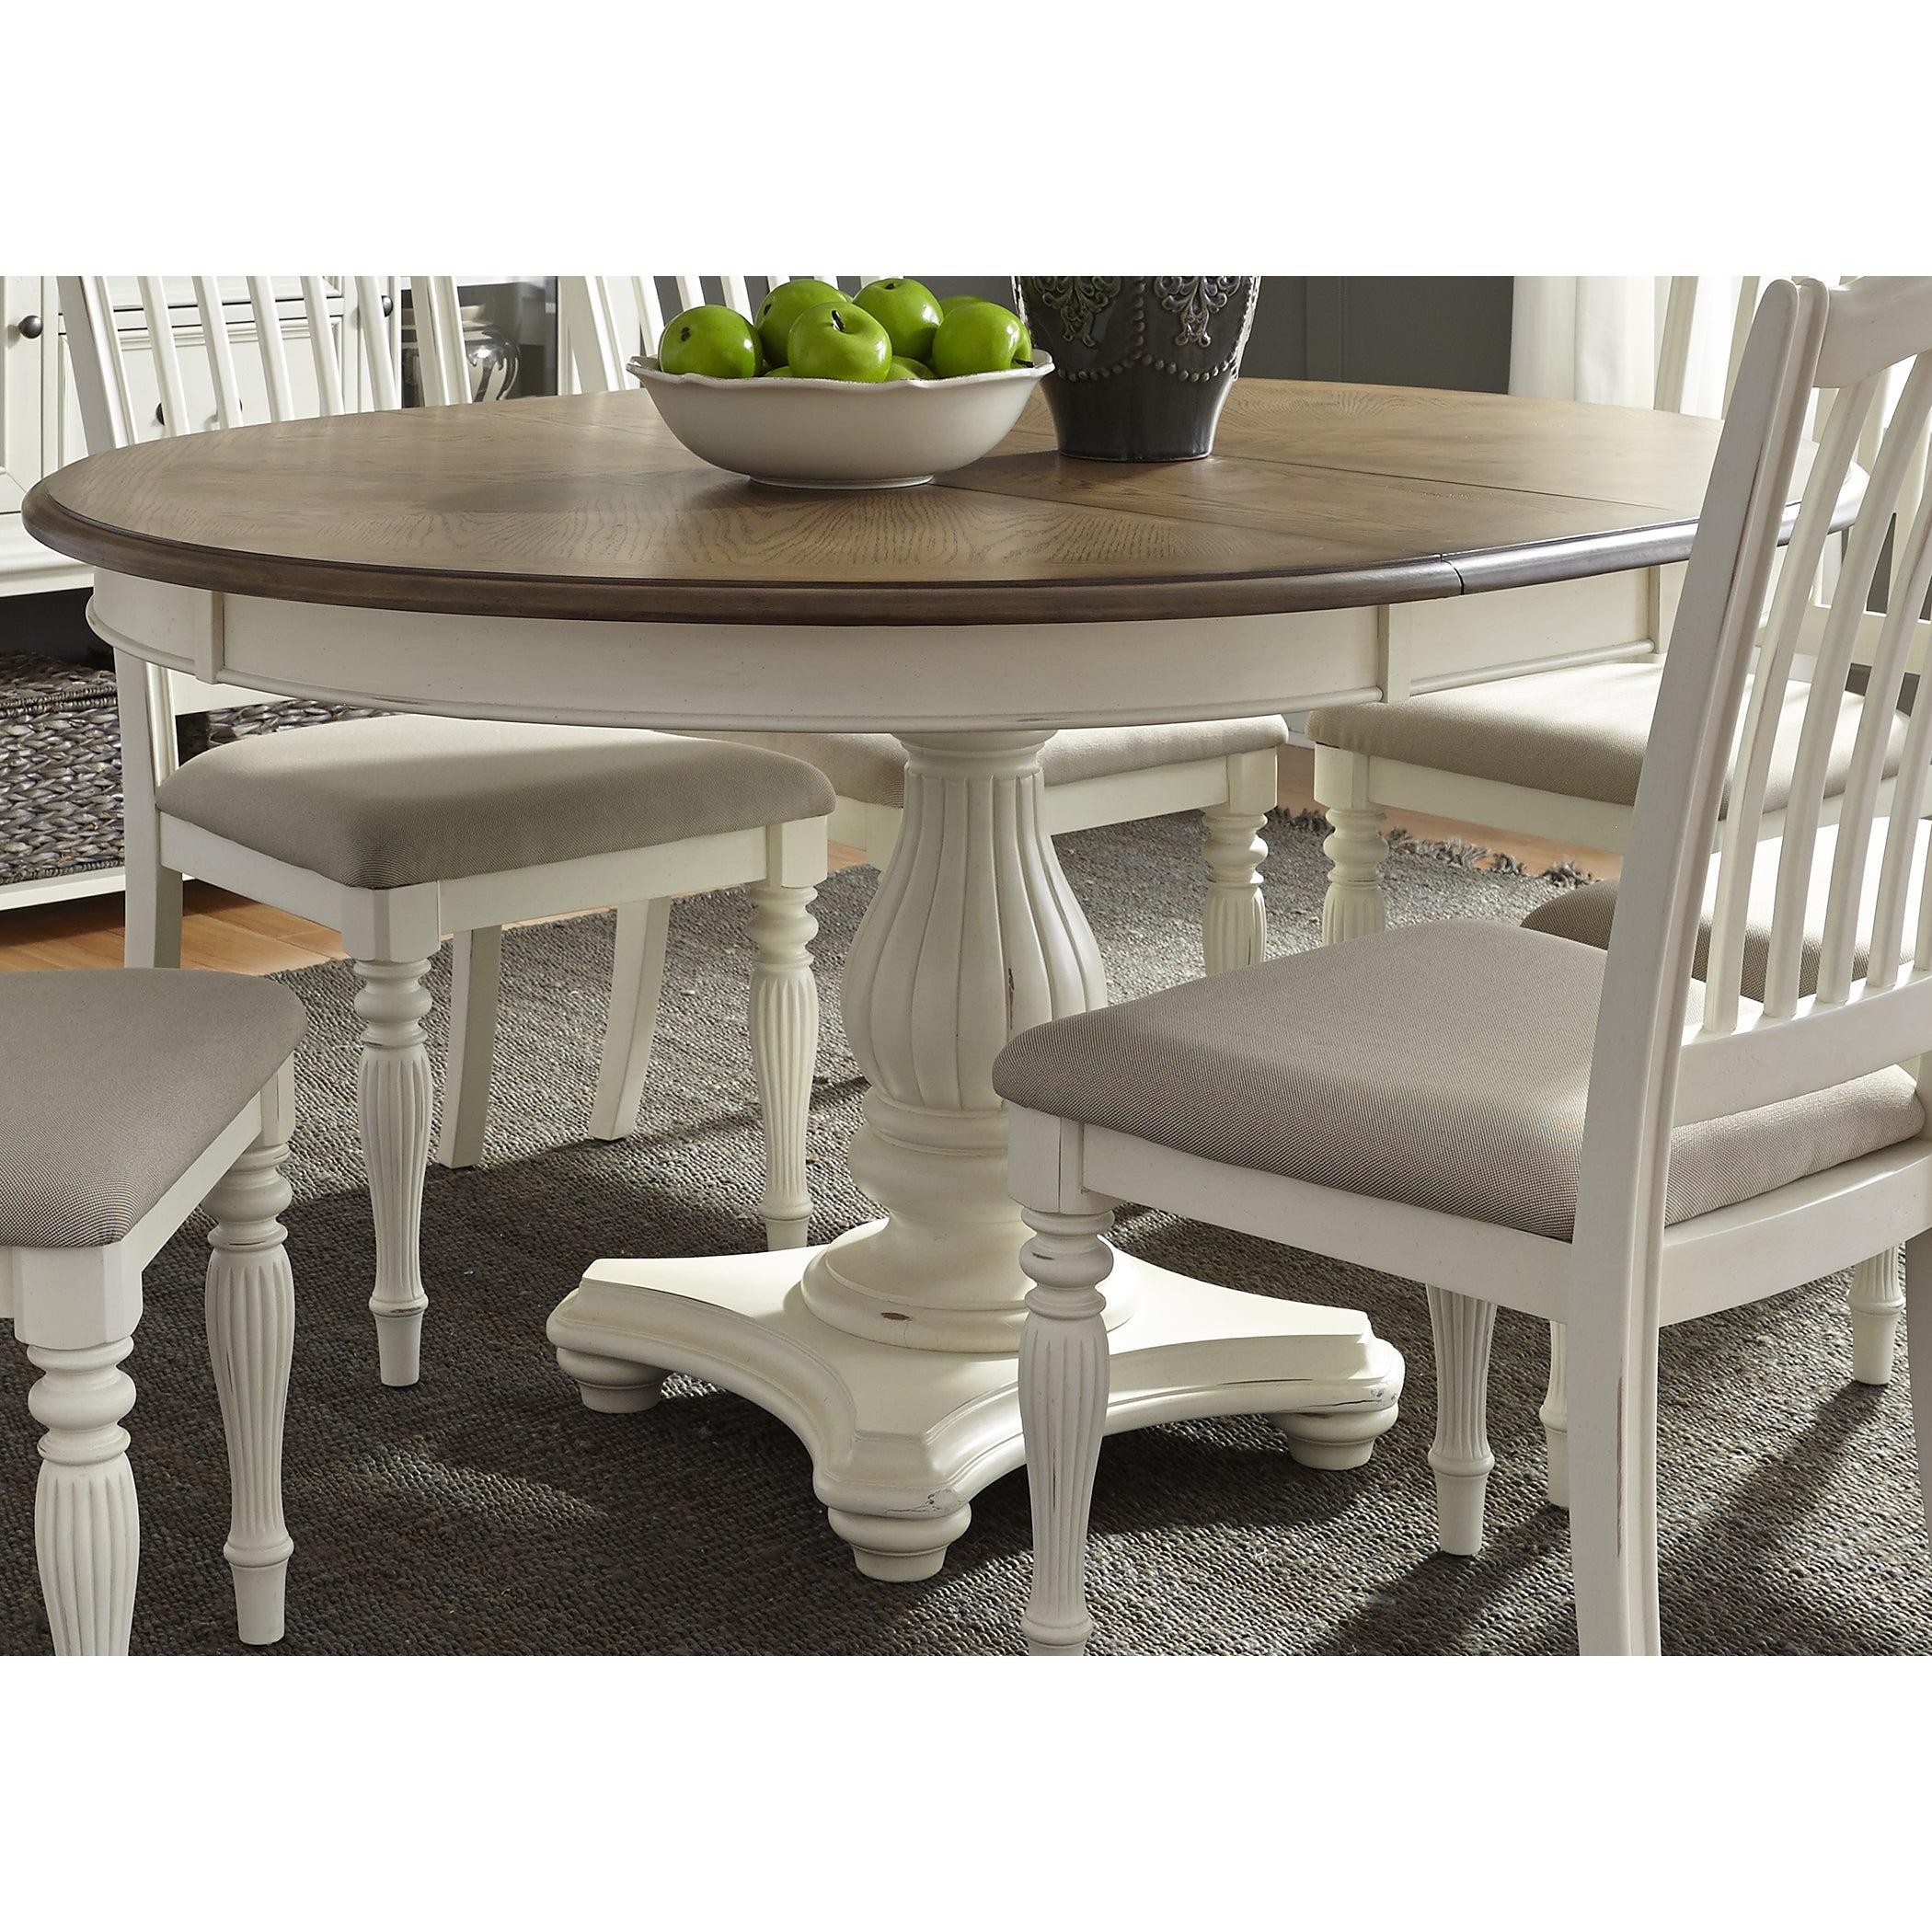 Cumberland Creek 48x60 Single Pedestal Oval Dinette Table - White ...